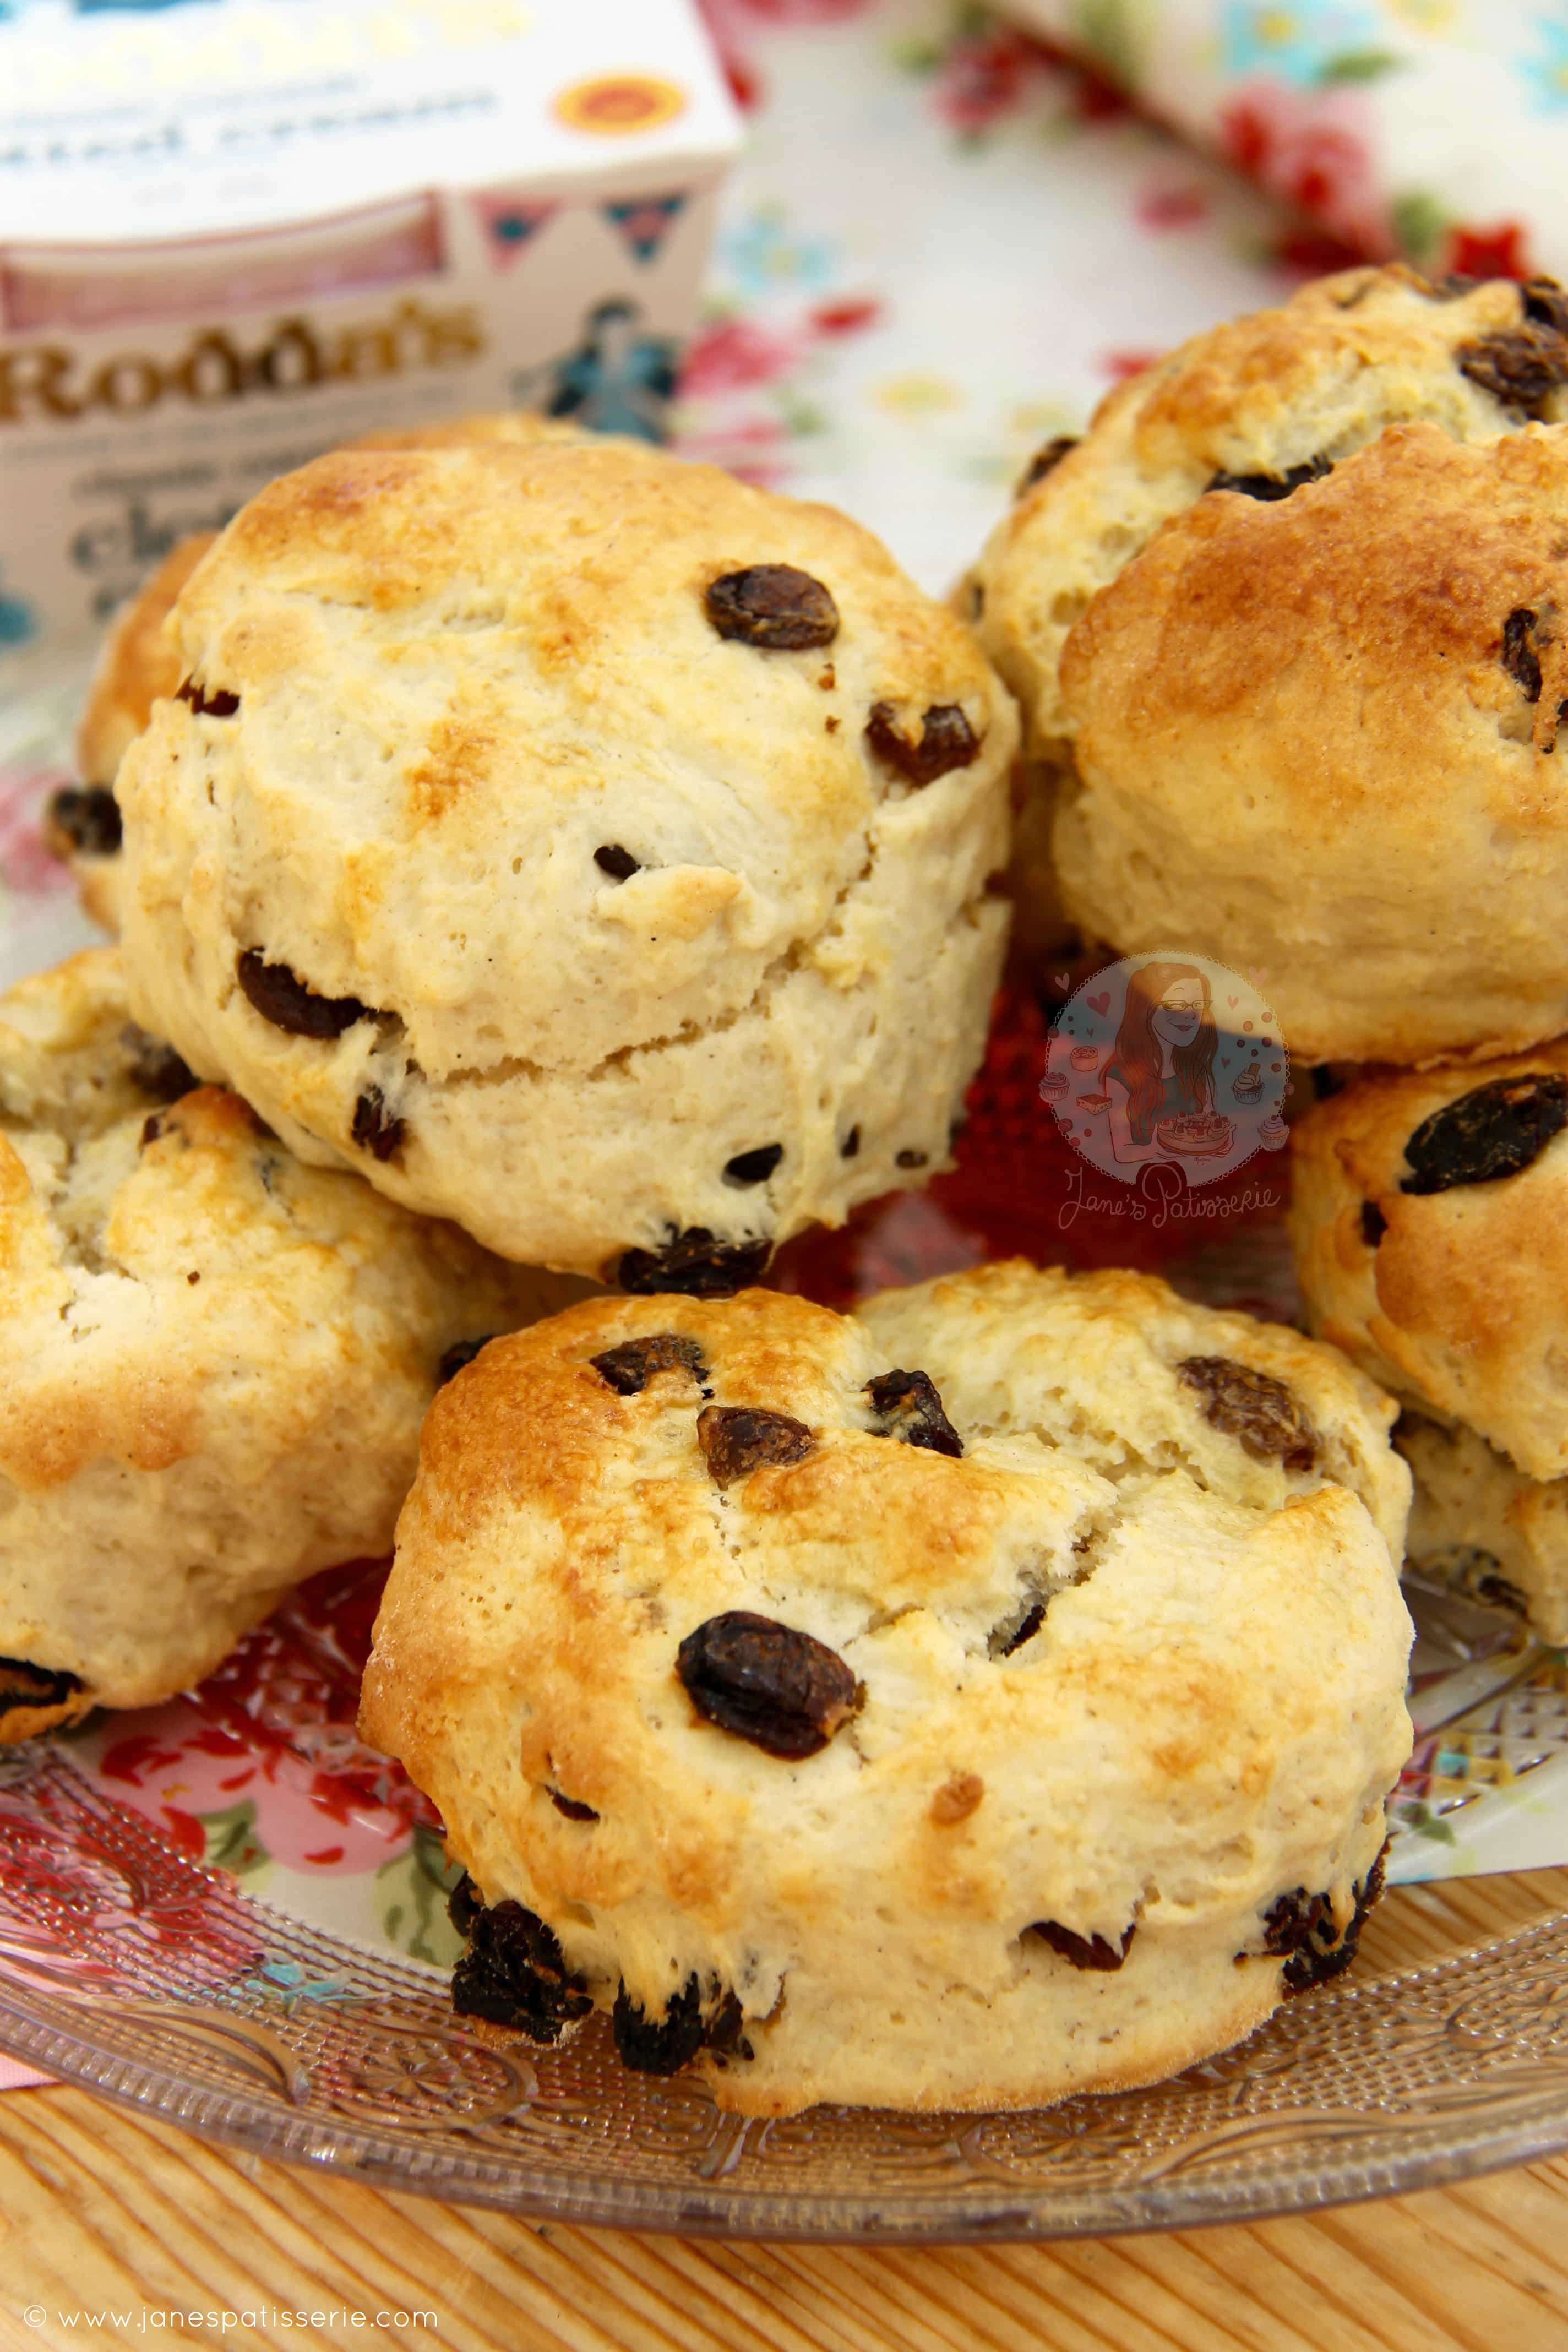 Fruit Scones! - Jane's Patisserie